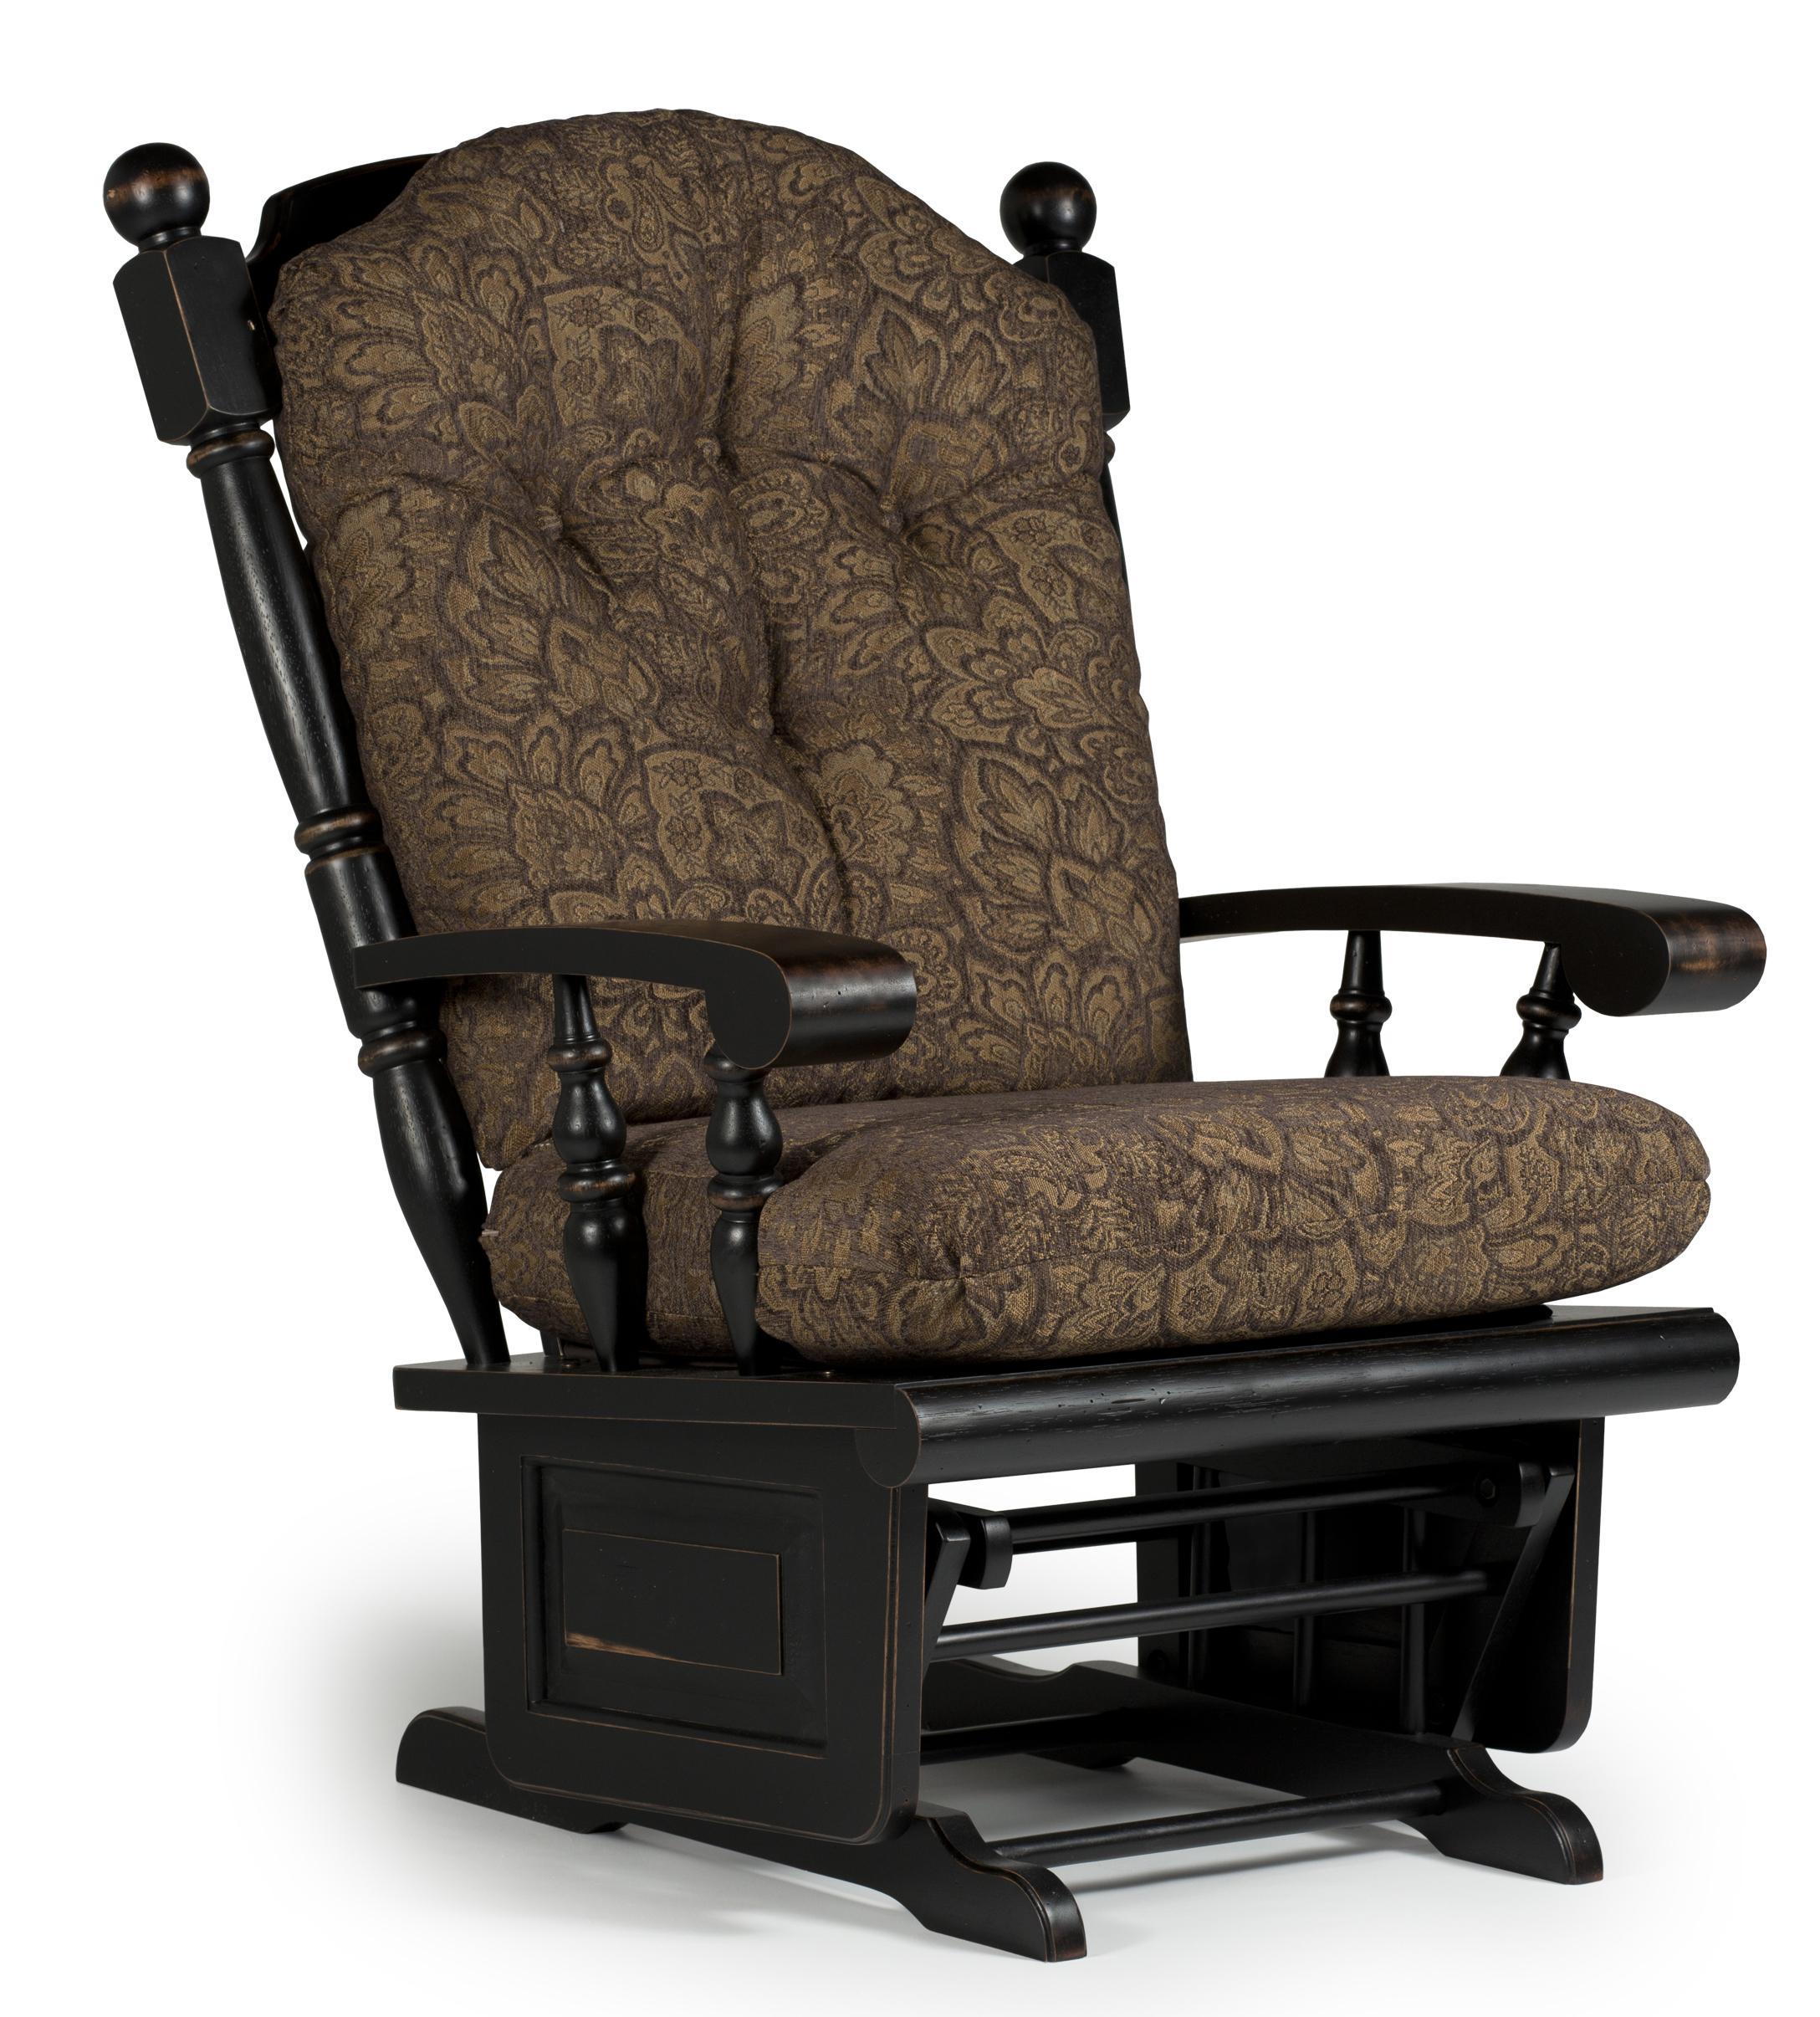 Lockable Bedroom Furniture Delling Glider Rocker With Lockable Mechanism By Best Home